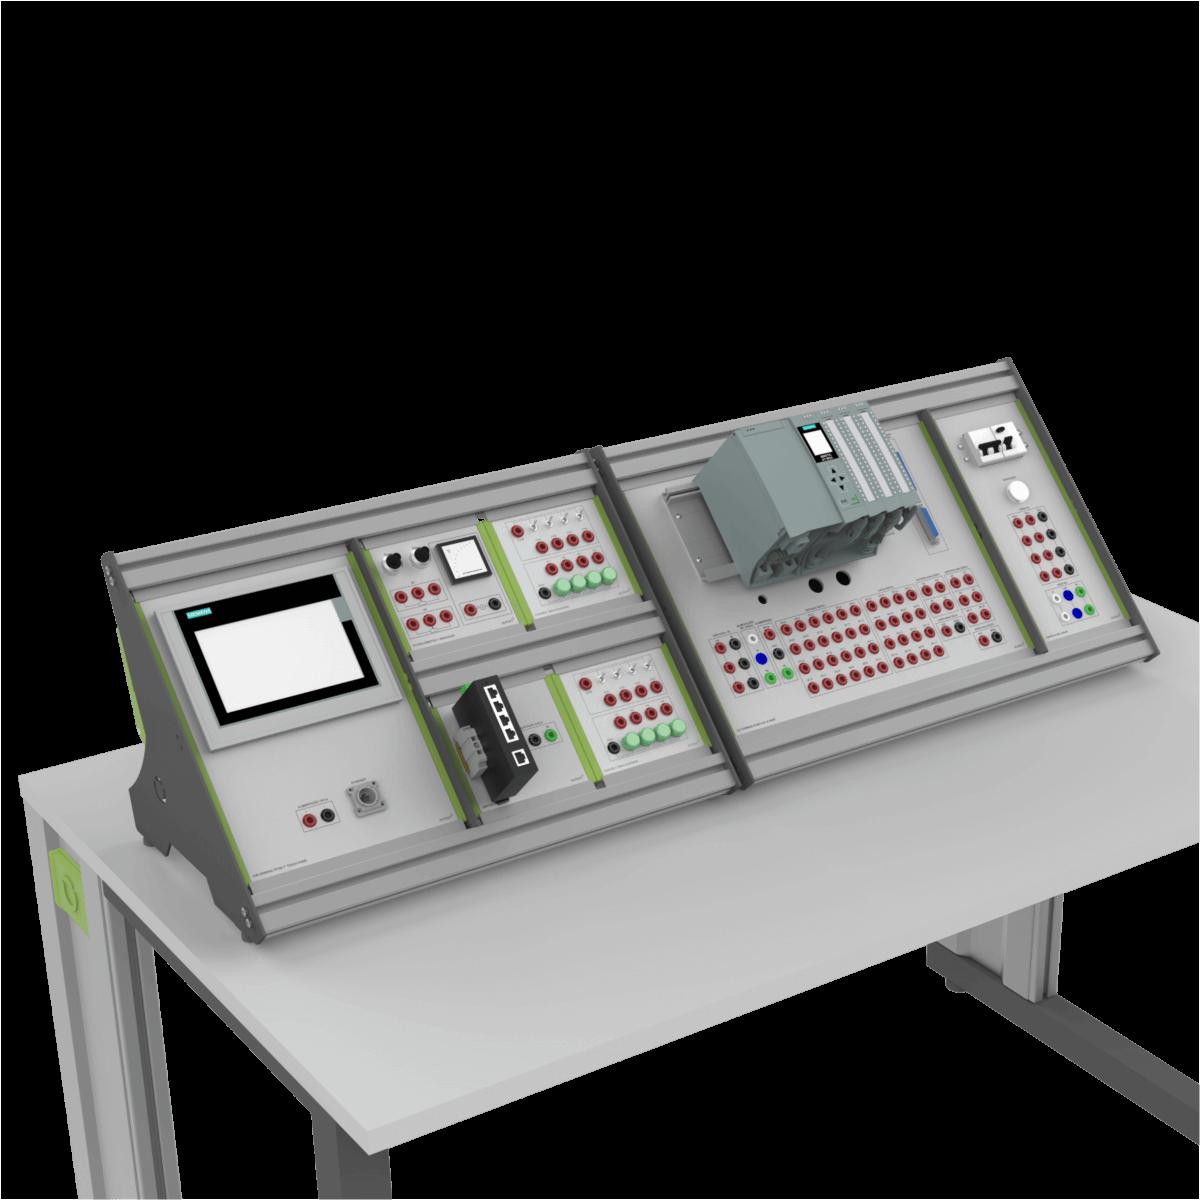 lab-automacao-bancada-didatica-rack-desktop-clp-s7-1500-auttom-7